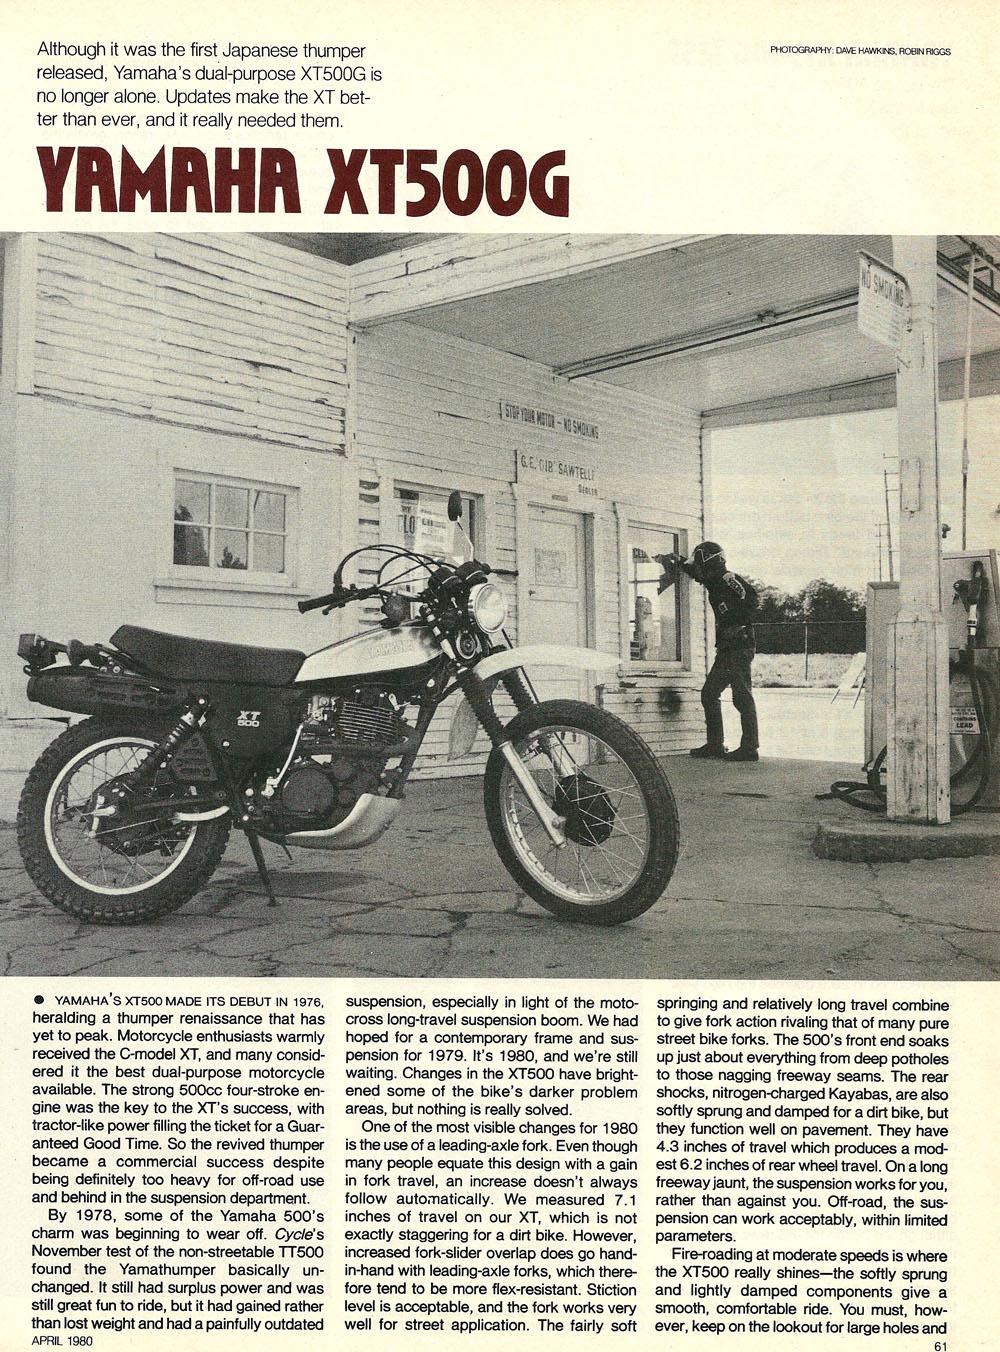 1980 Yamaha XT500G road test 01.jpg